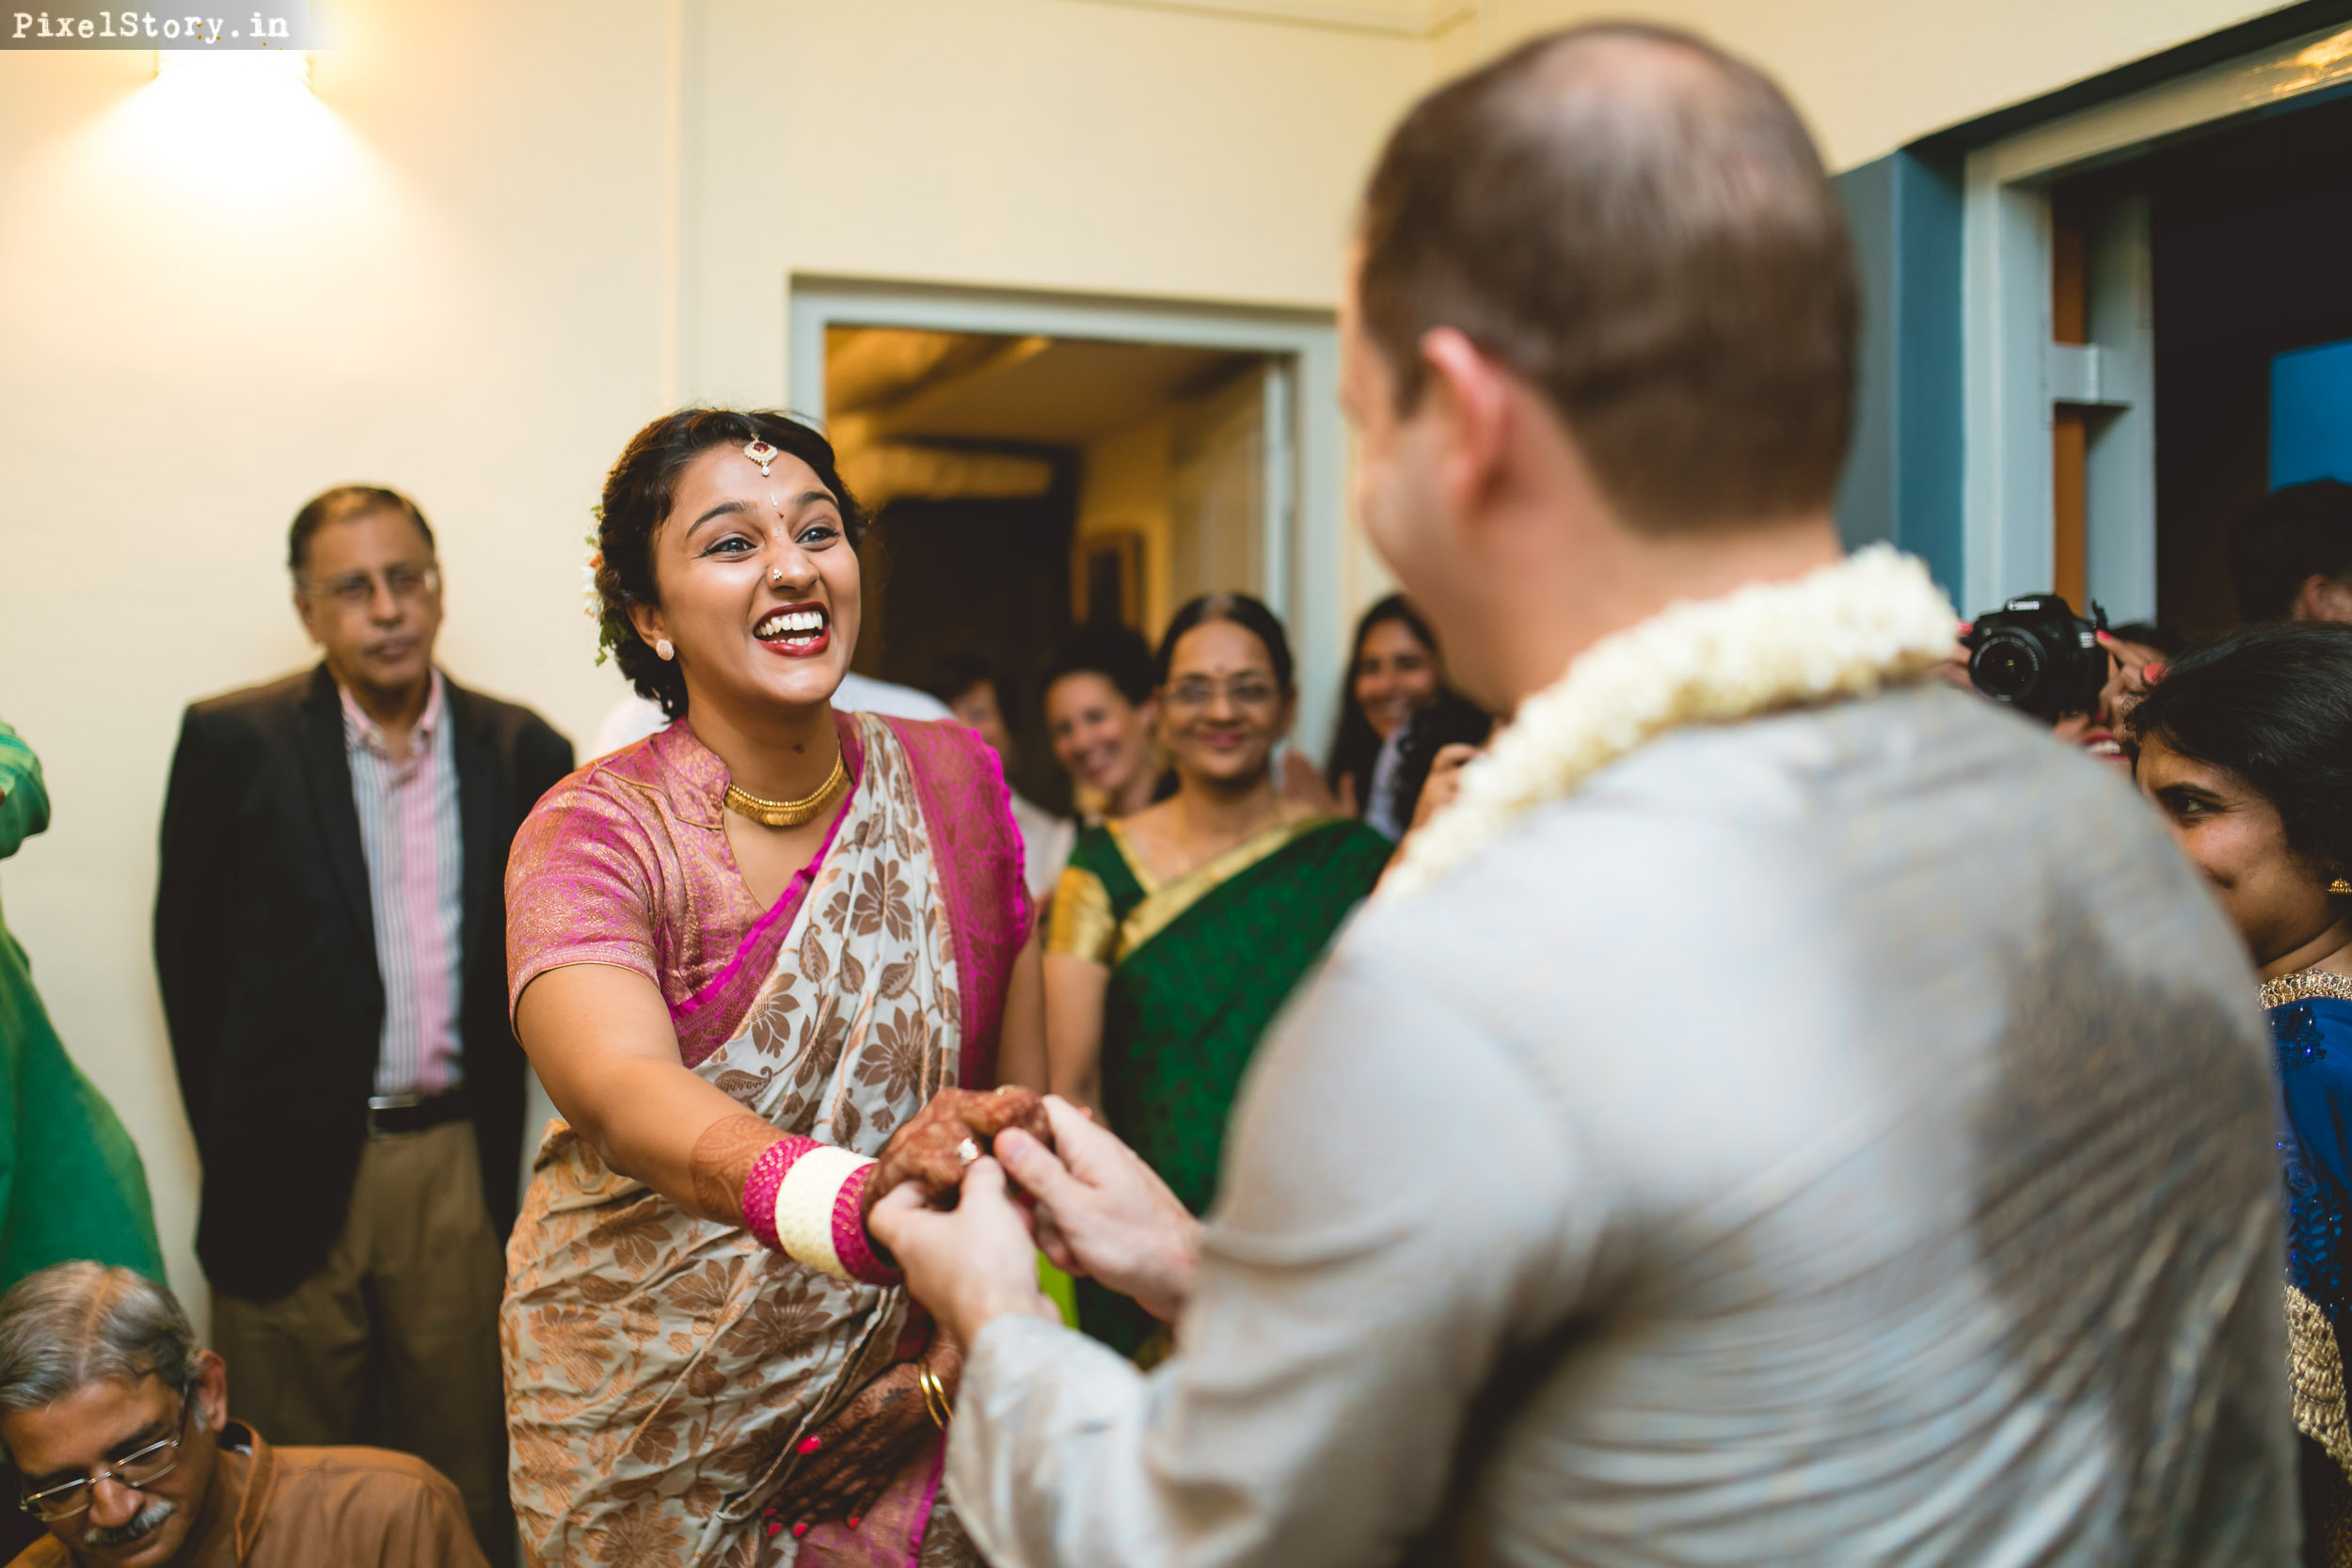 PixelStory-Jungle-Wedding-Photographer-Masinagudi-Indo-French008.jpg